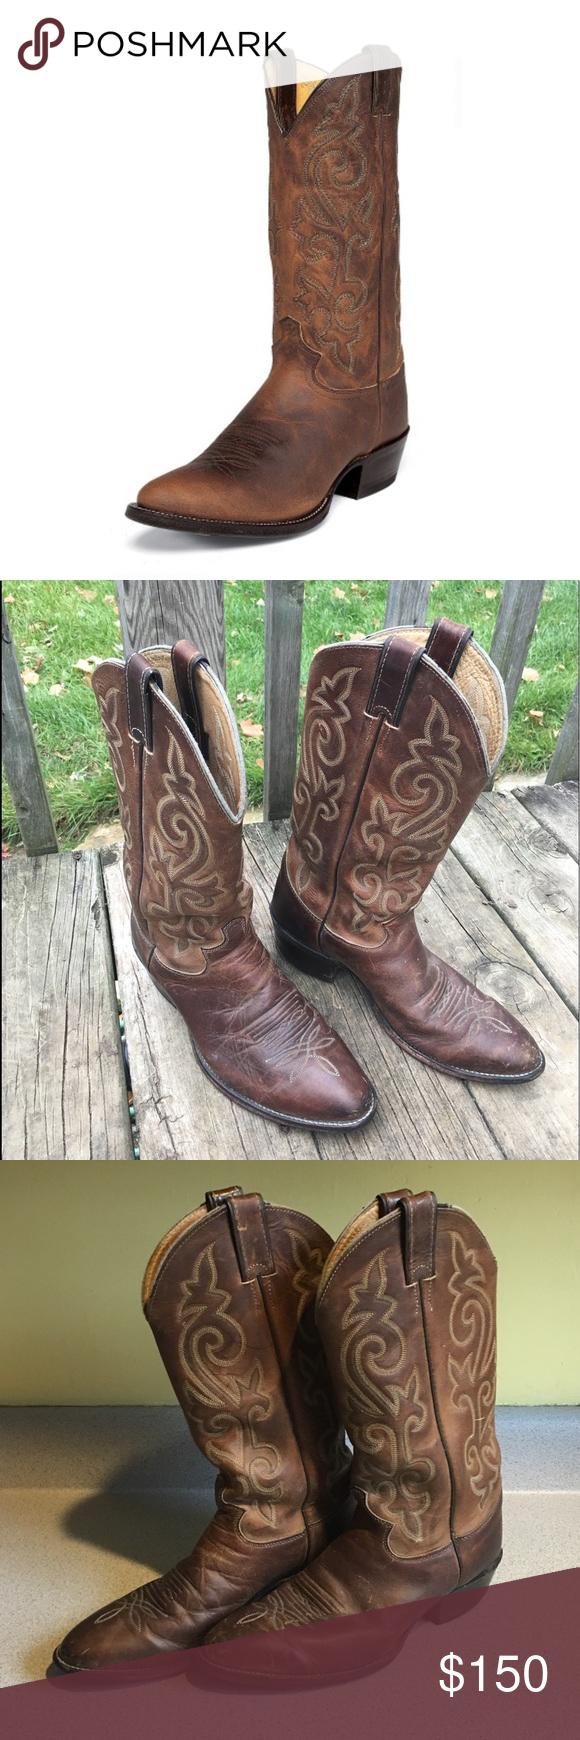 4dac7c69be4 Justin Buck Bay Apache Cowboy Boots Size 9 Justin Cowboy Boots Size ...